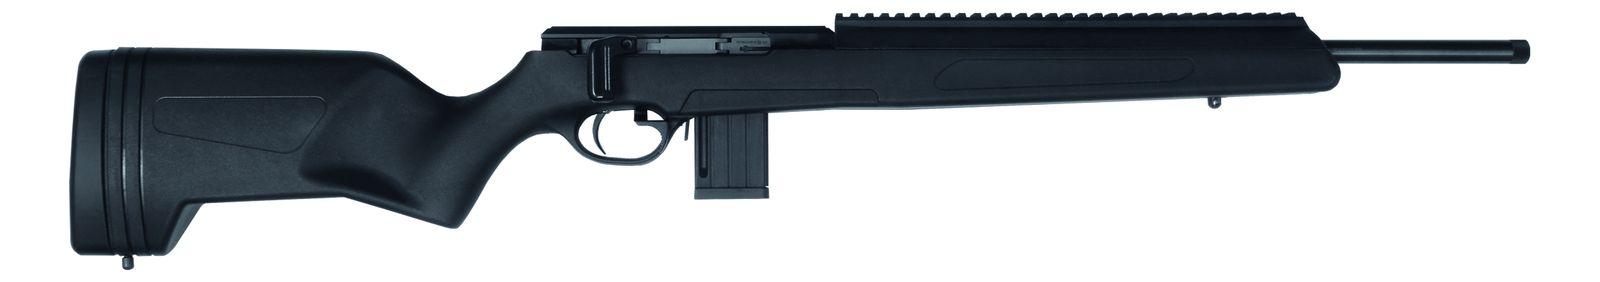 Carabine ISSC SCOUT BLACK